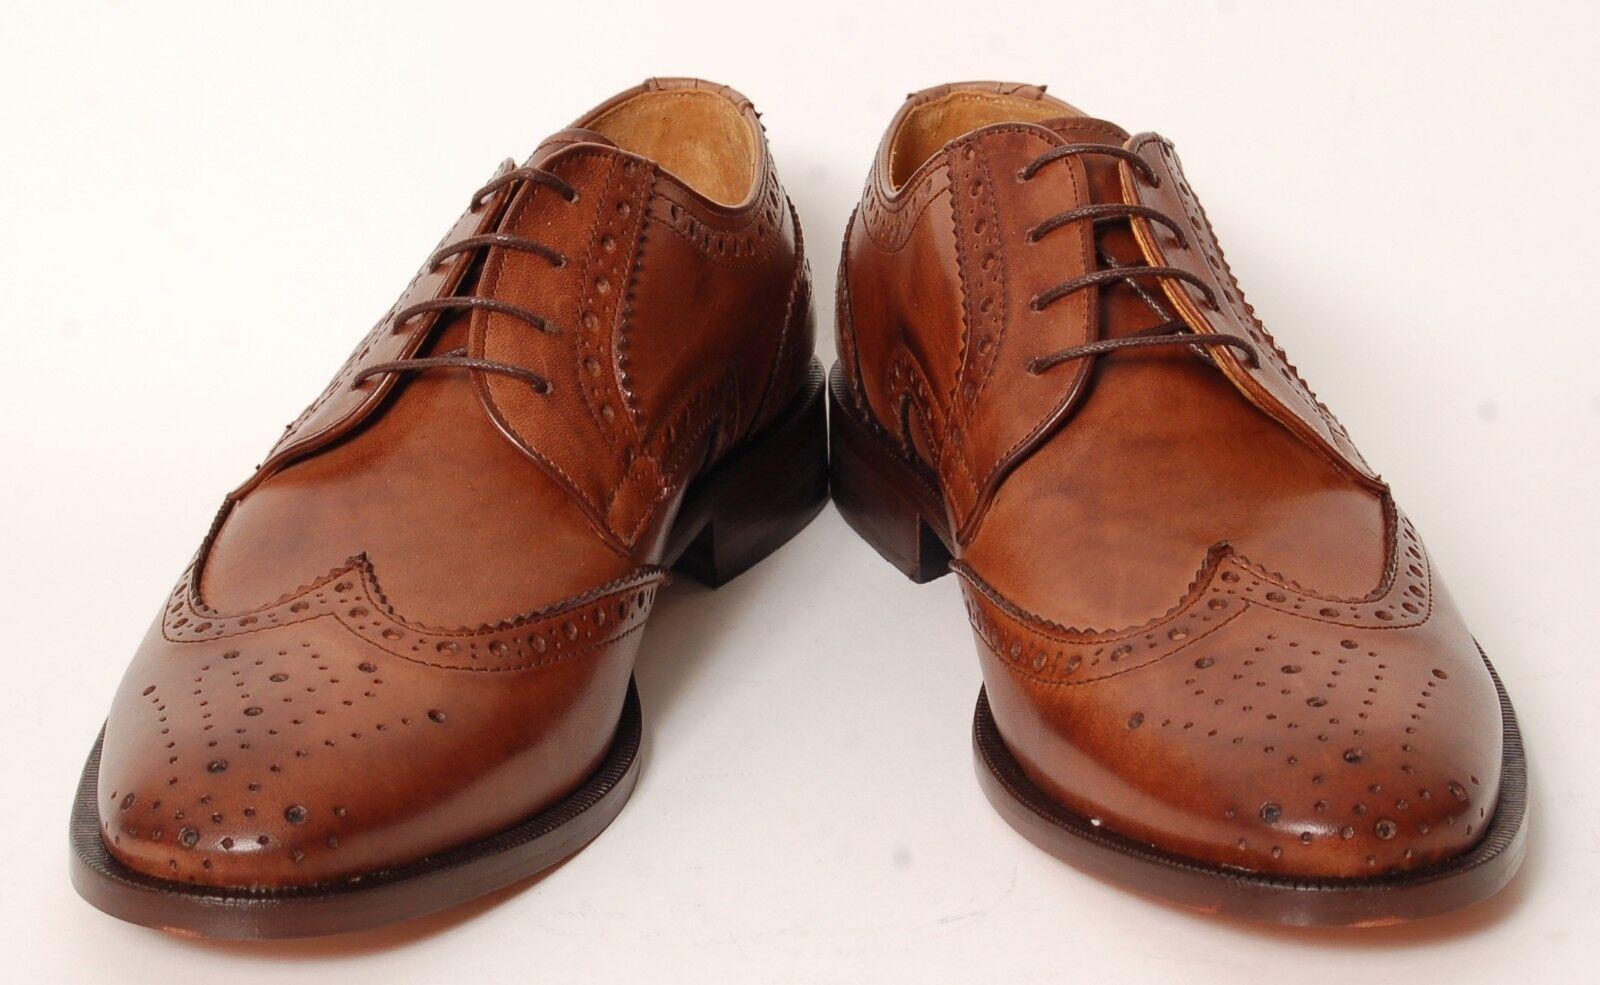 Zapatos - Antica Calzoleria Calzoleria Antica Campana - vollbrogue 7295 18b554